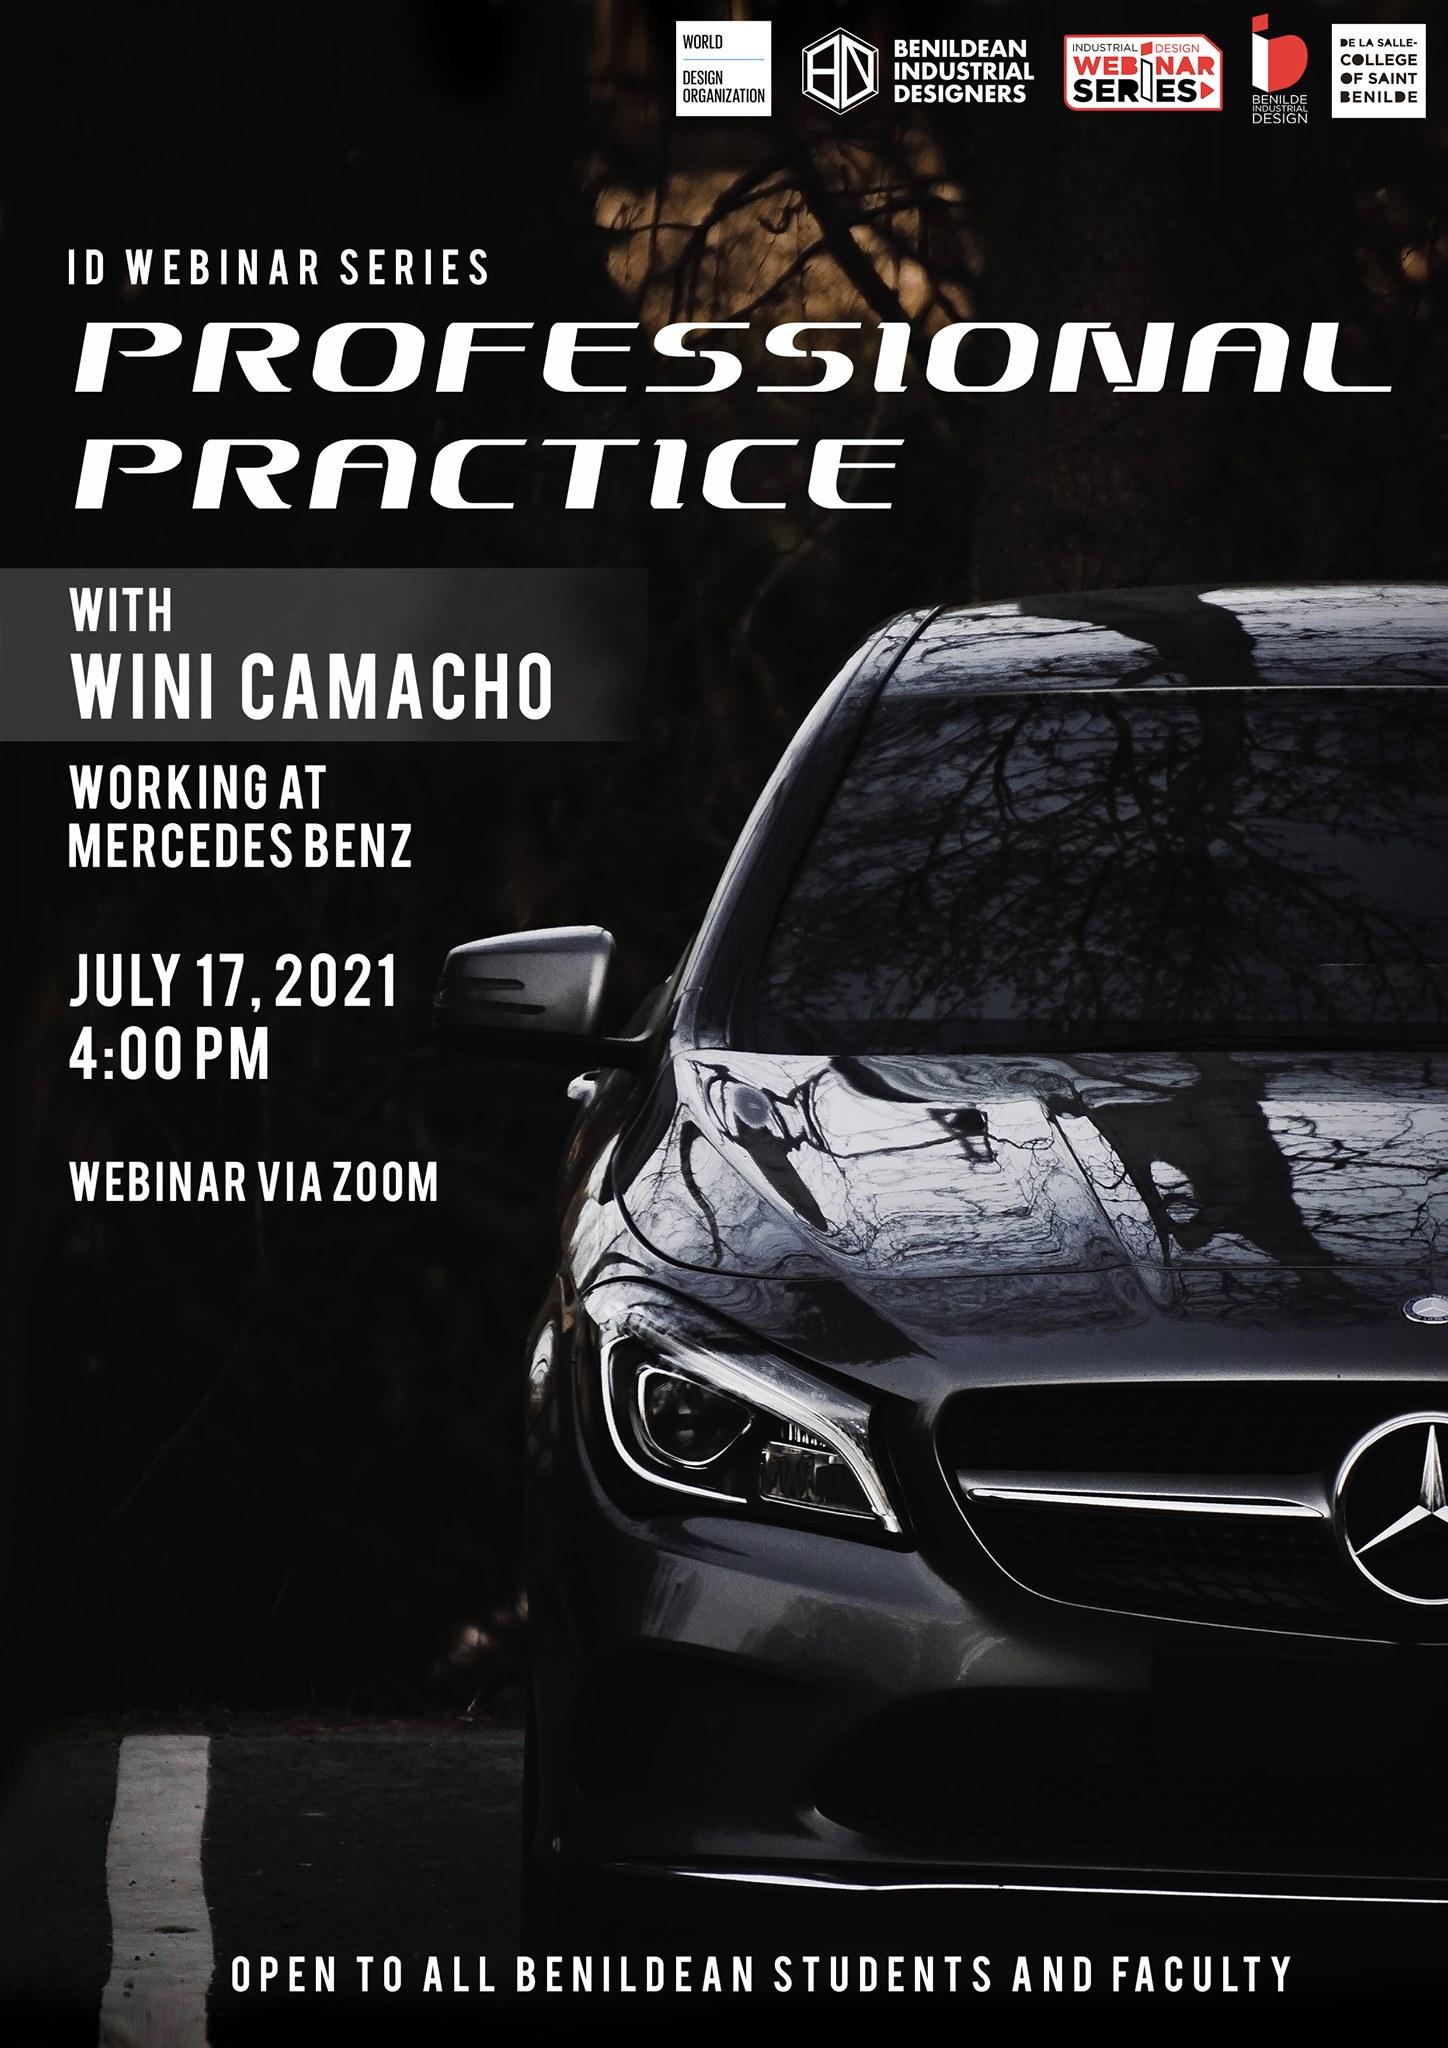 Register now!  https://tinyurl.com/ProfessionalPracticeReg